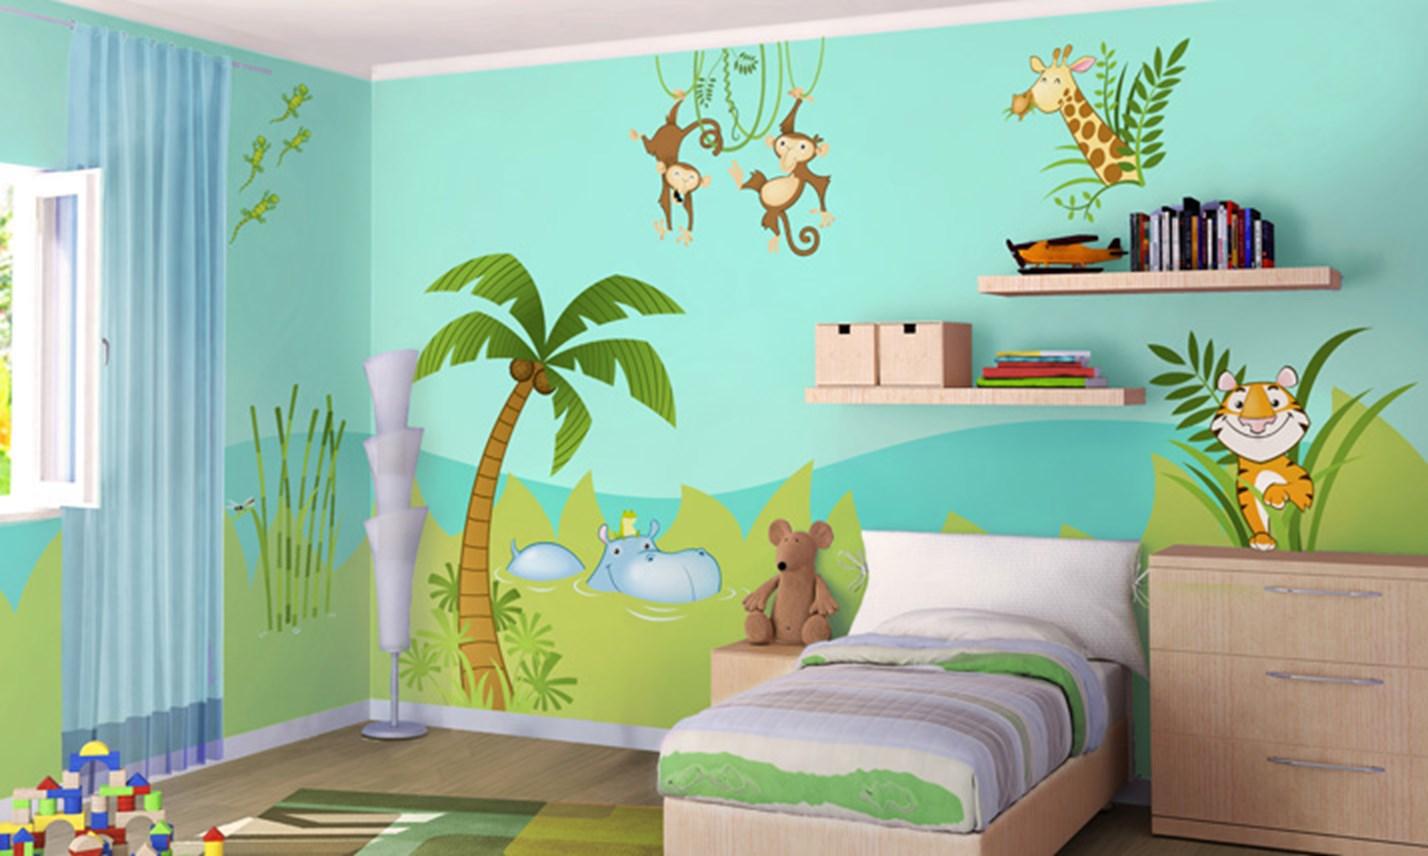 Idee Dipingere Cameretta Bambini : 135 idee per dipingere una cameretta idee cameretta bimba arredare